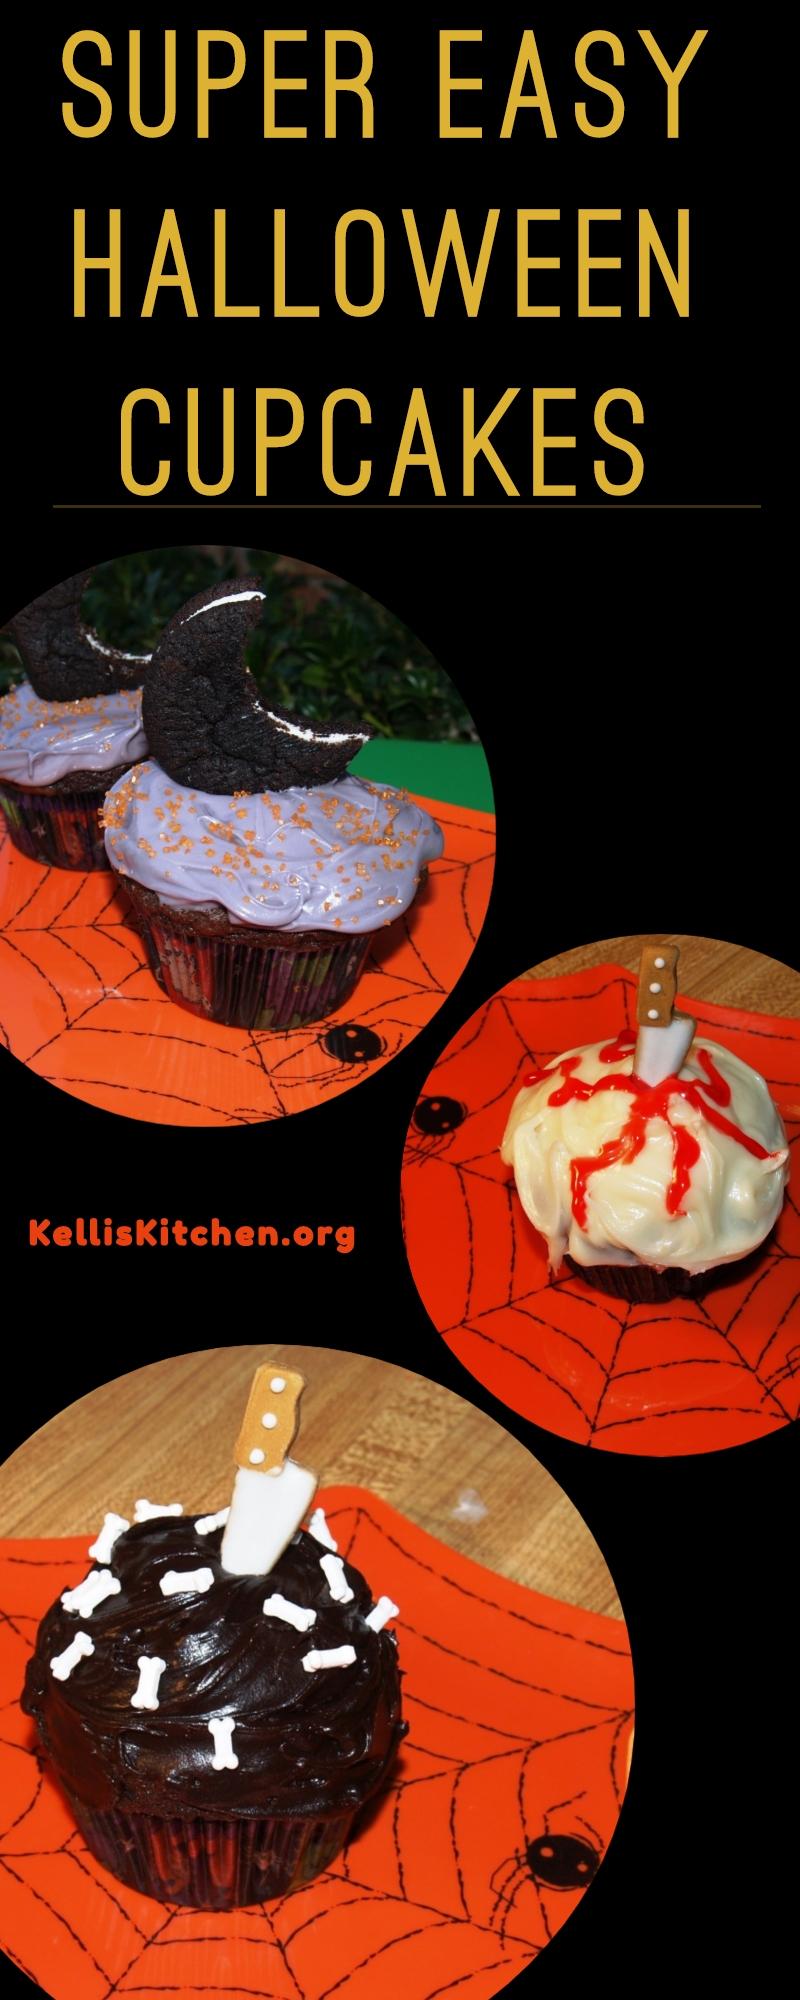 SUPER EASY HALLOWEEN CUPCAKES via @KitchenKelli